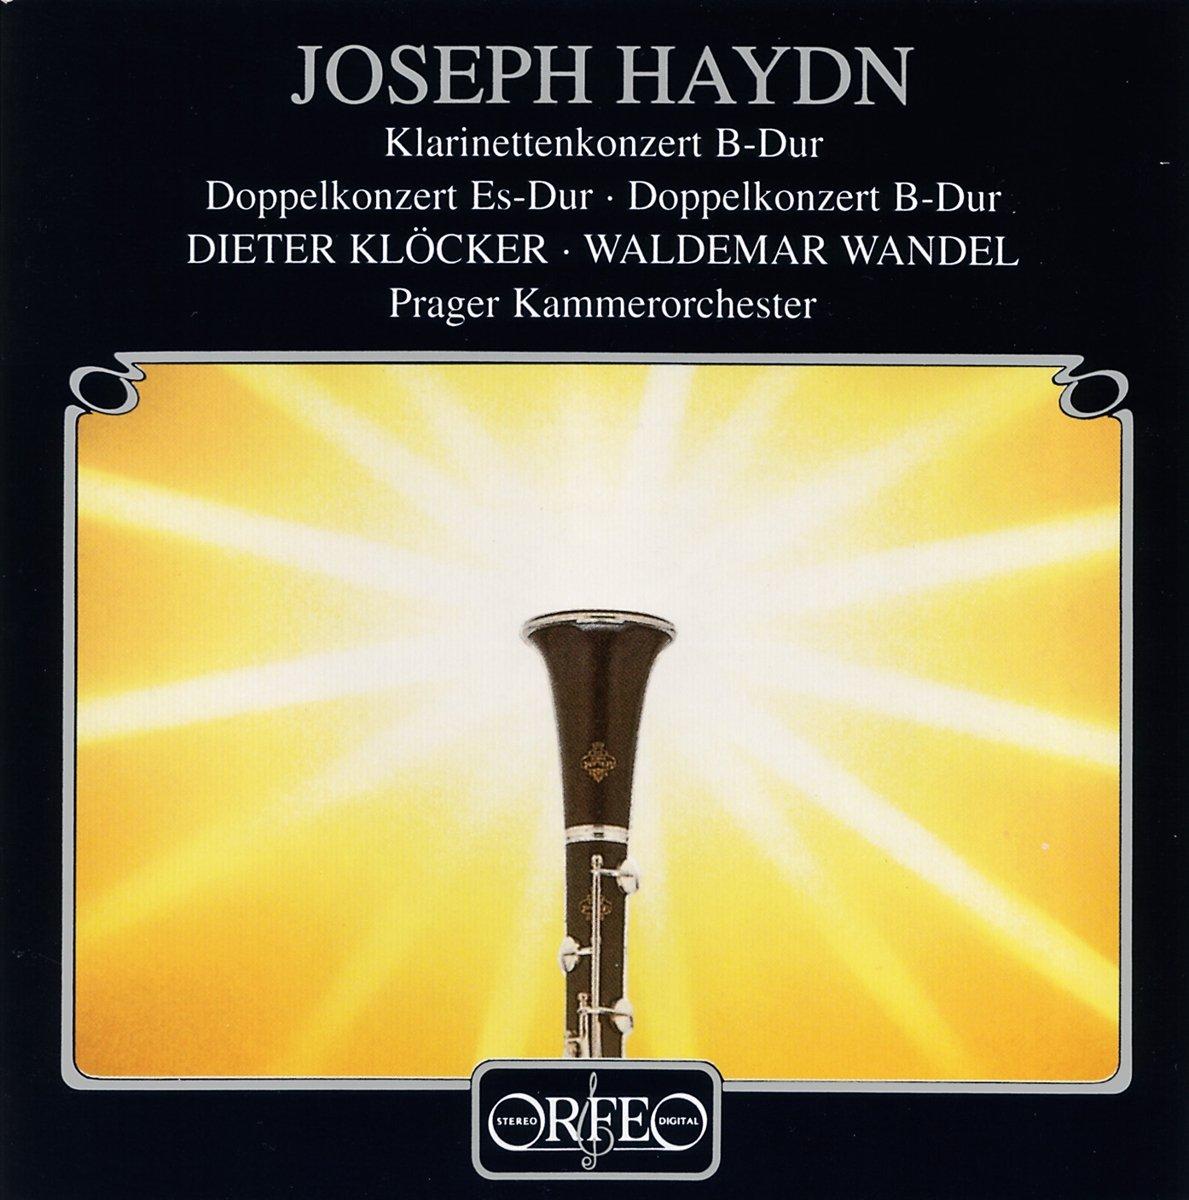 Joseph Haydn (1732-1809) - Page 14 71KaGqUMwtL._SL1200_